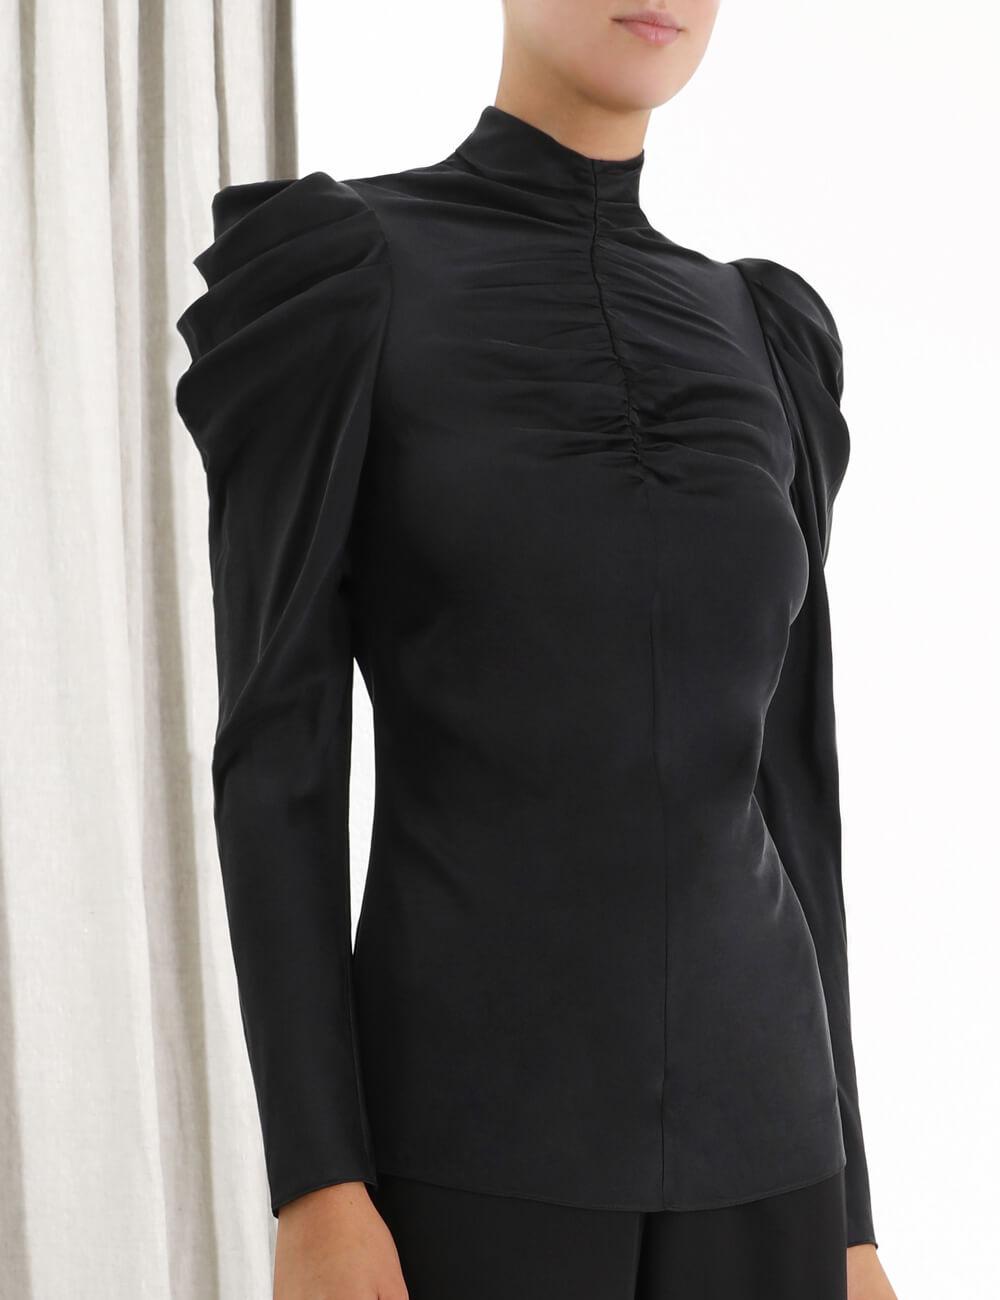 Espionage Silk Drape Top